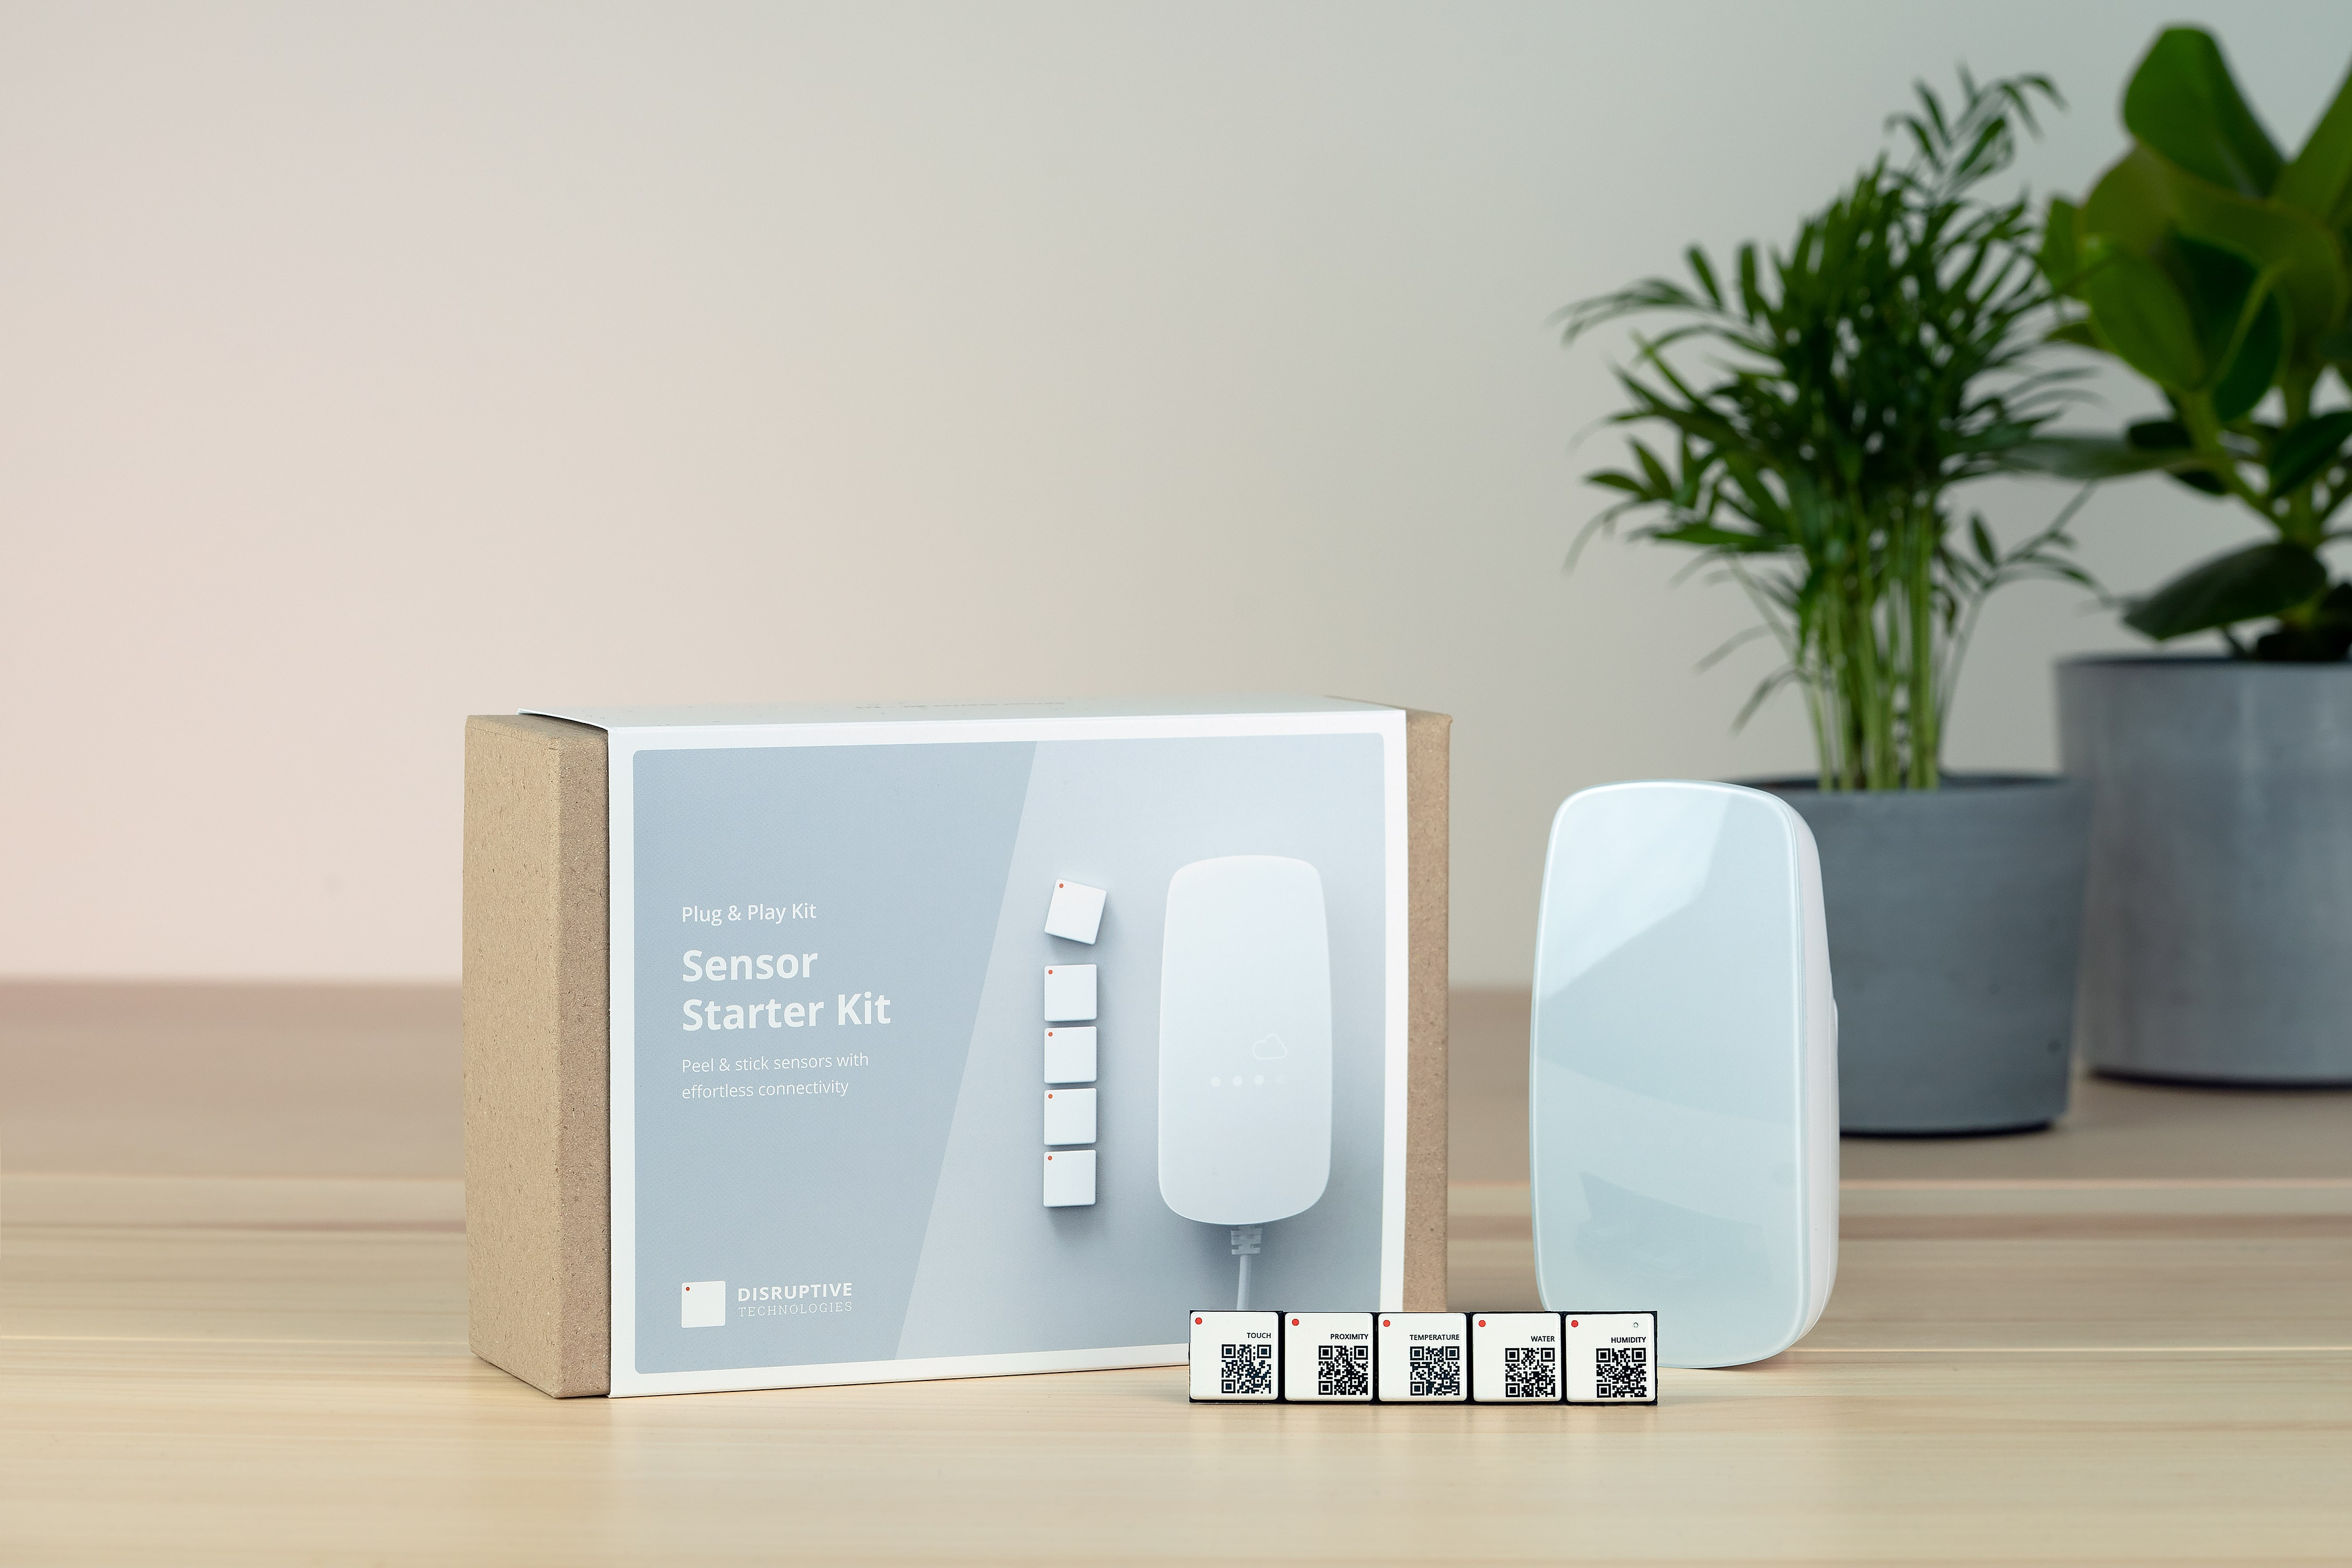 Sensor-Starer-Kit-Plants-min